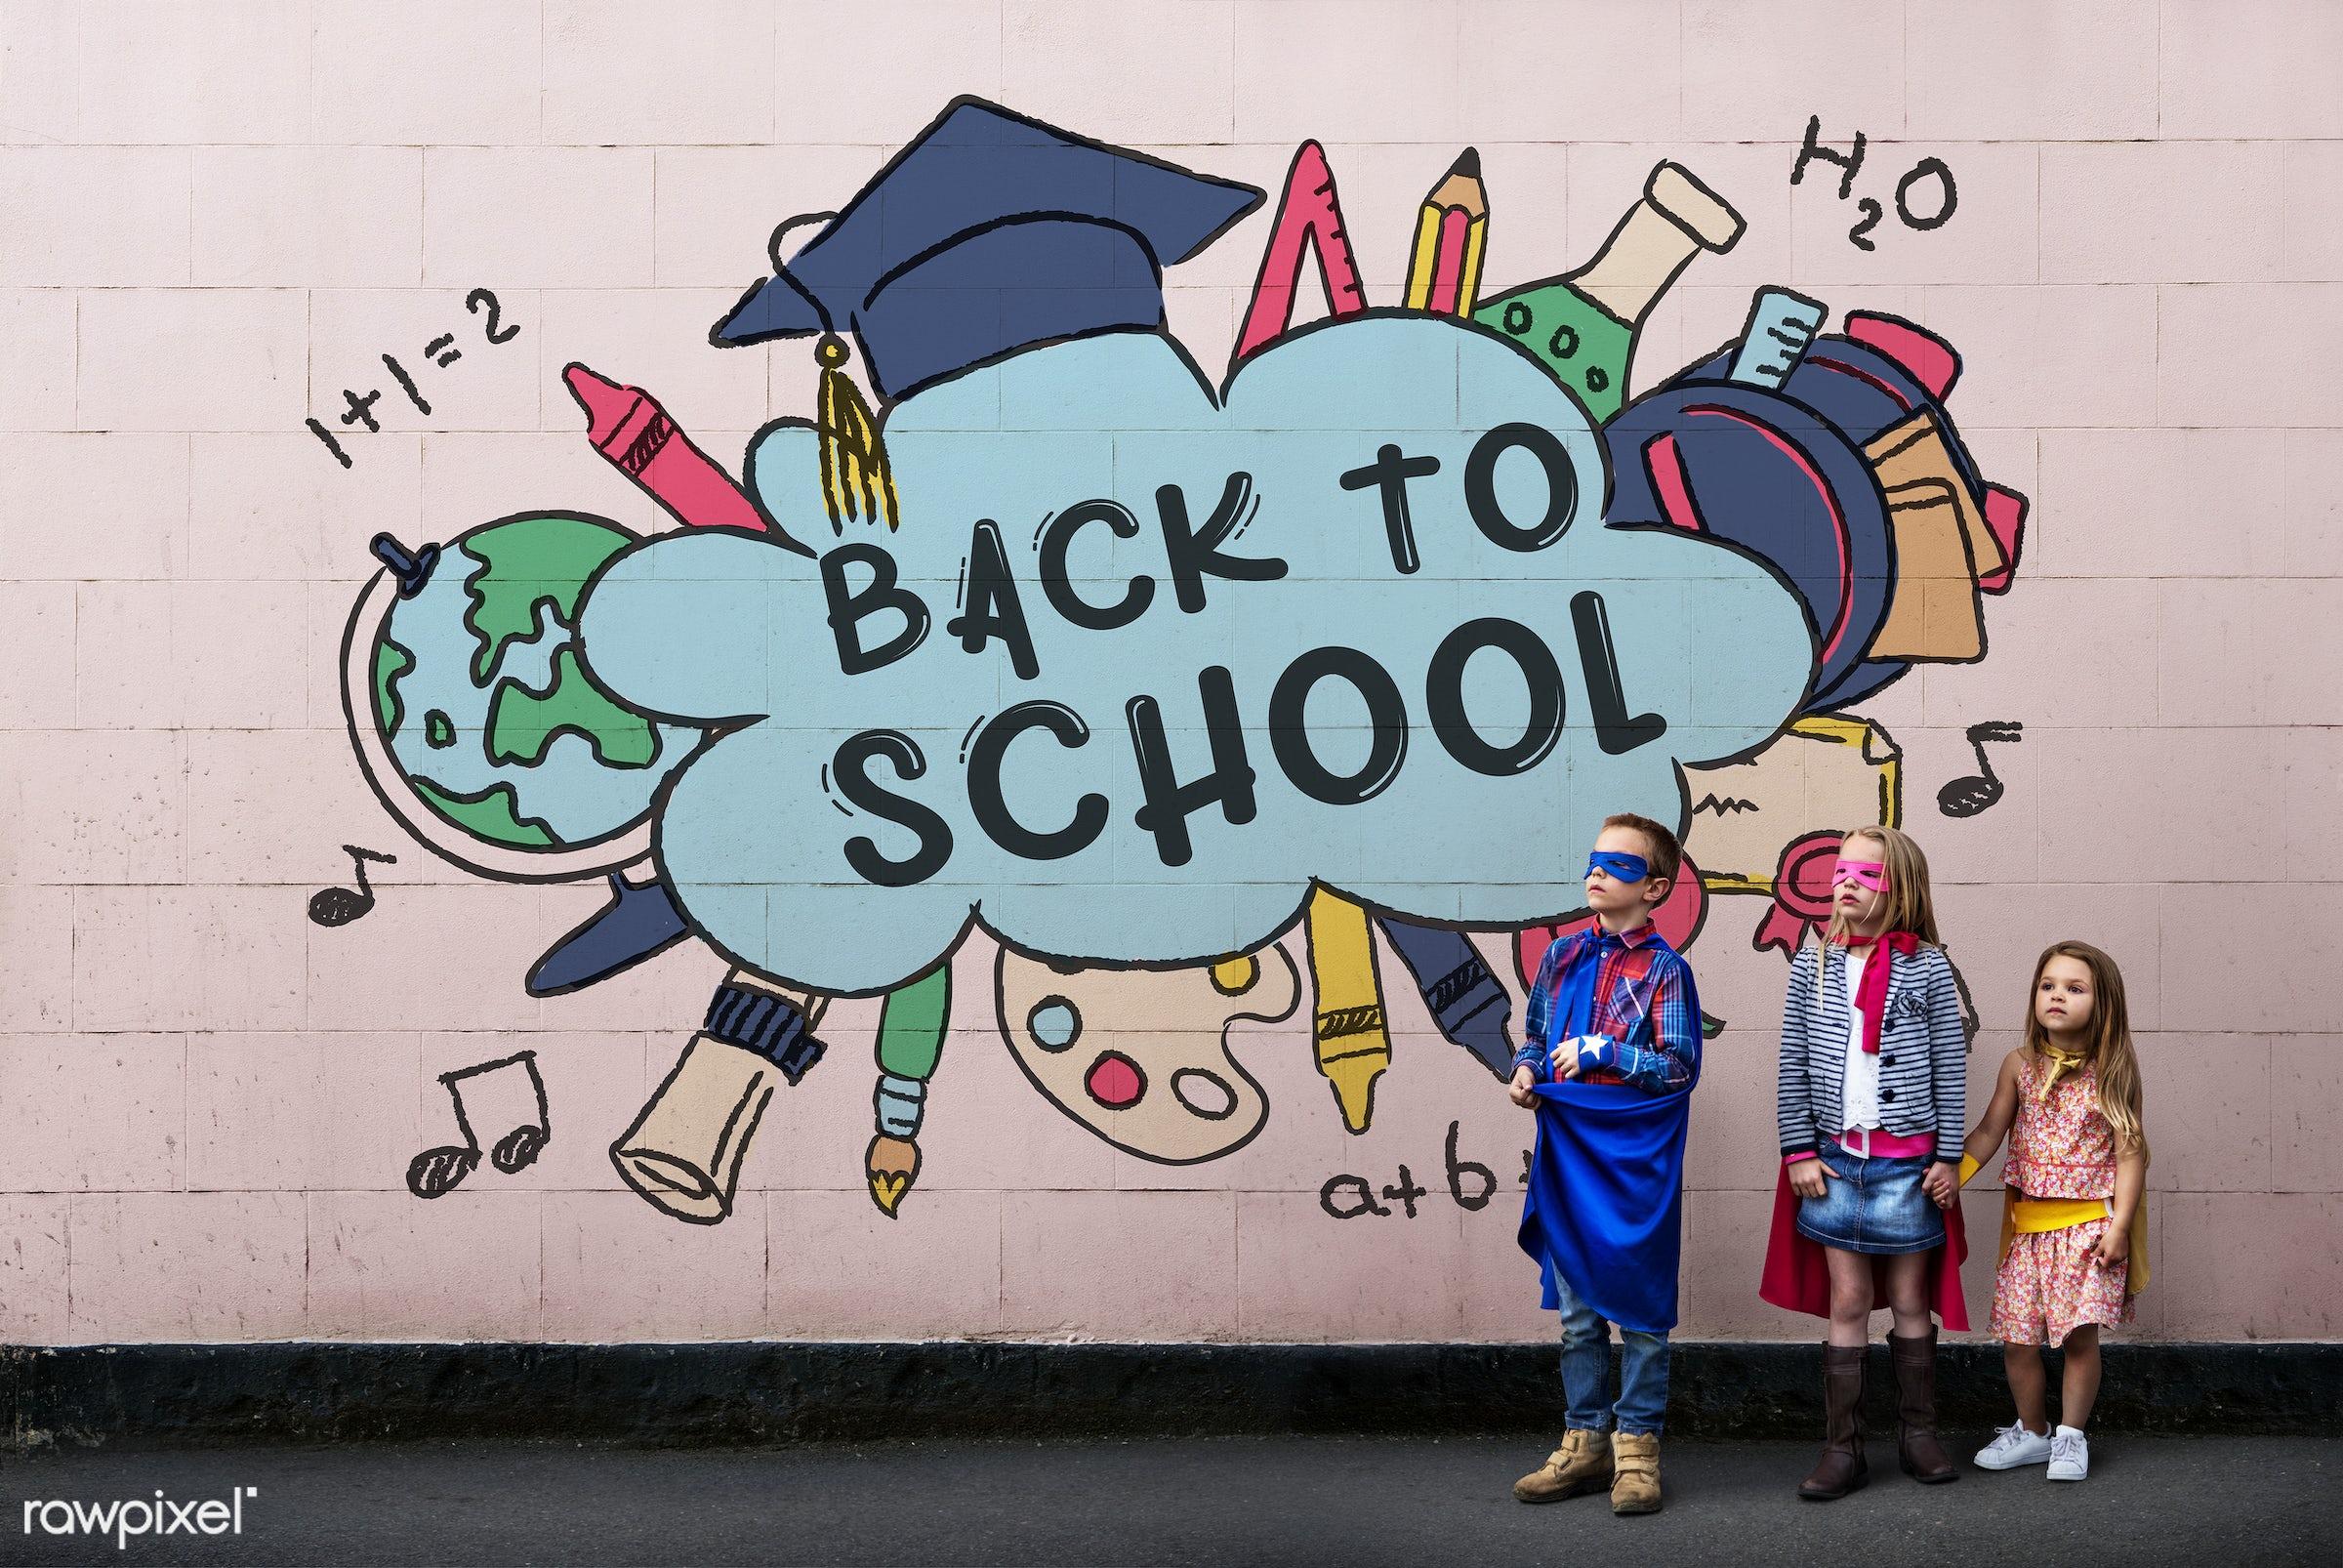 back, begin, boy, brave, brother, communication, costume, degree, development, dressed up, education, family, generation,...